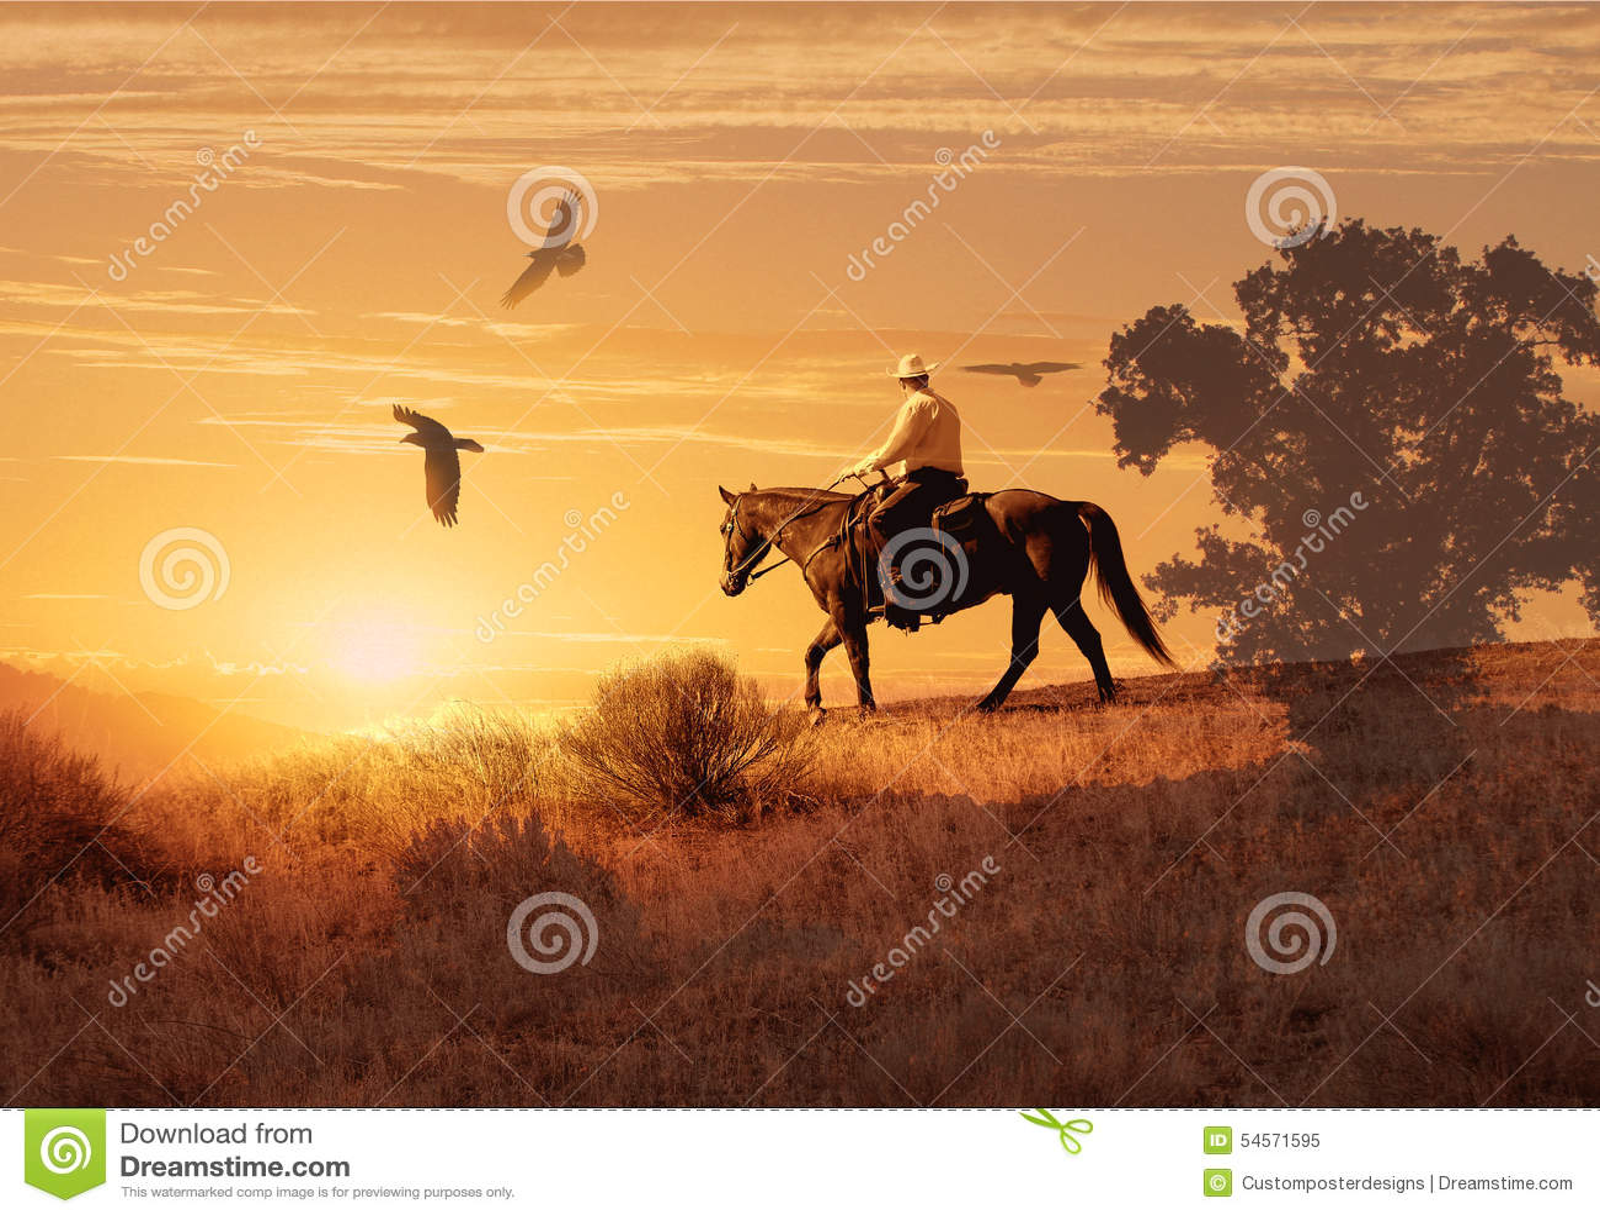 Cowboy riding on a horse.